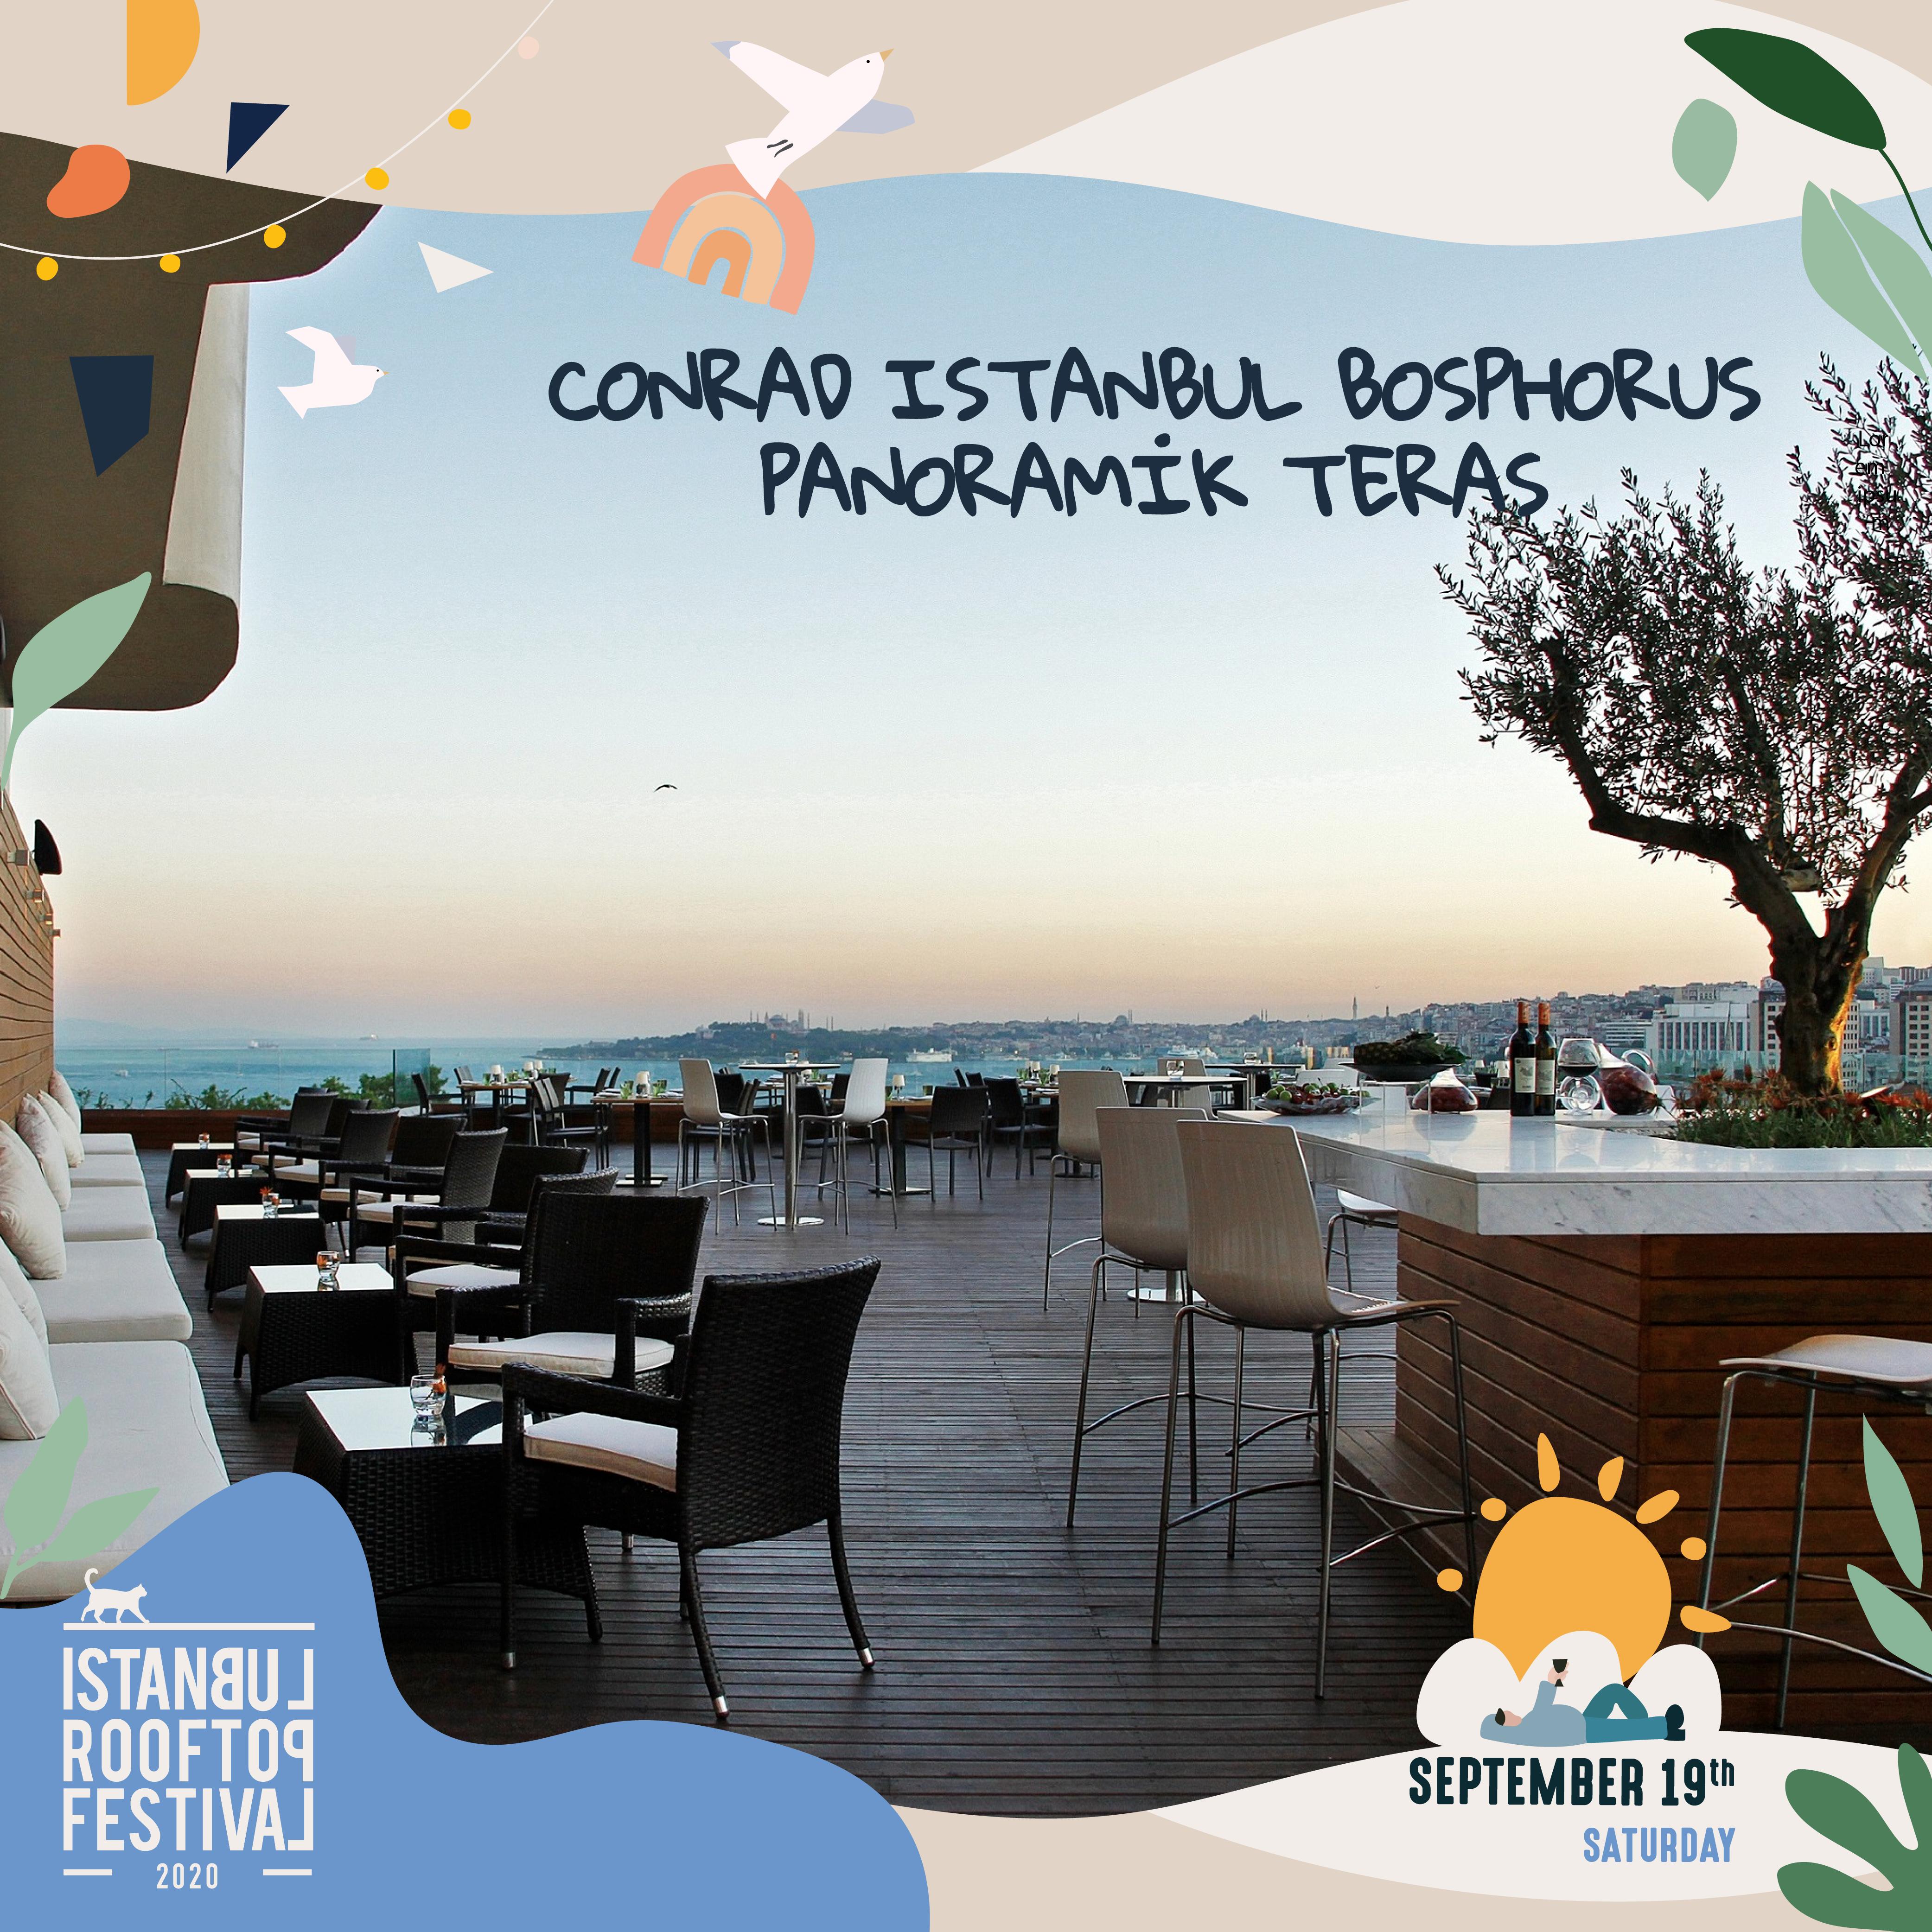 Conrad Bosphorus Istanbul Panoramik Teras